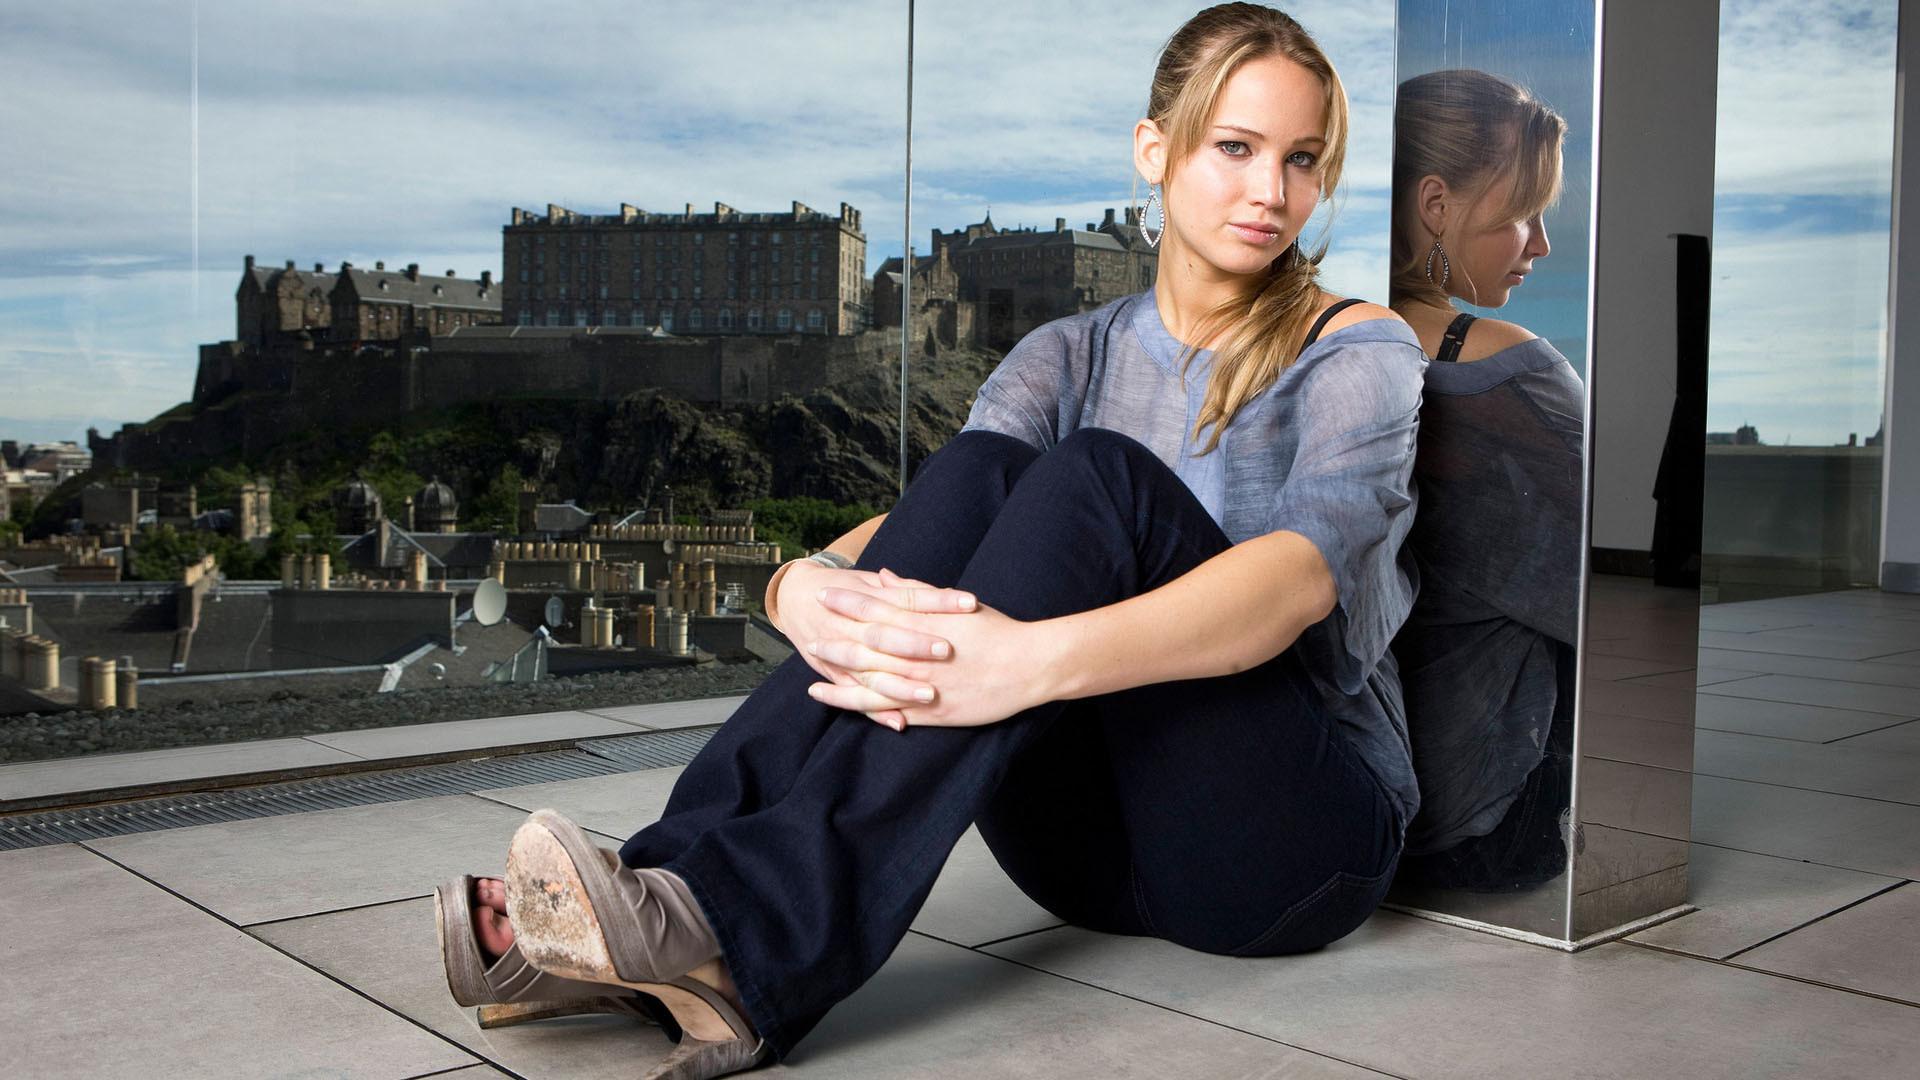 … Jennifer Lawrence HD Wallpaper …